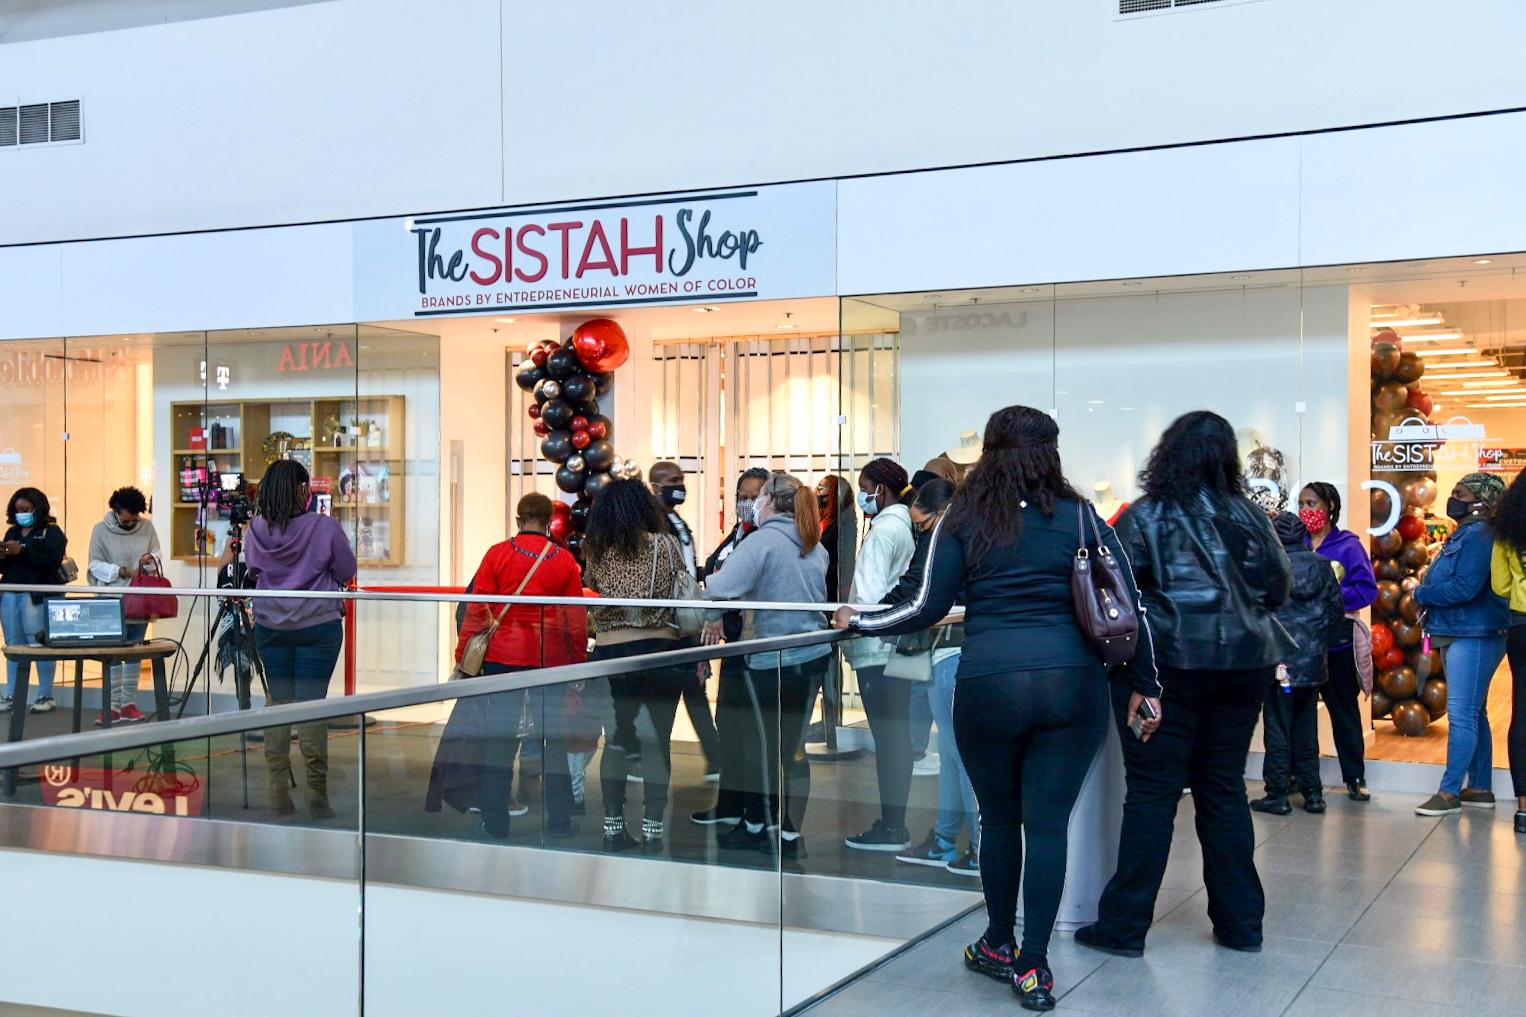 The Sistah Shop